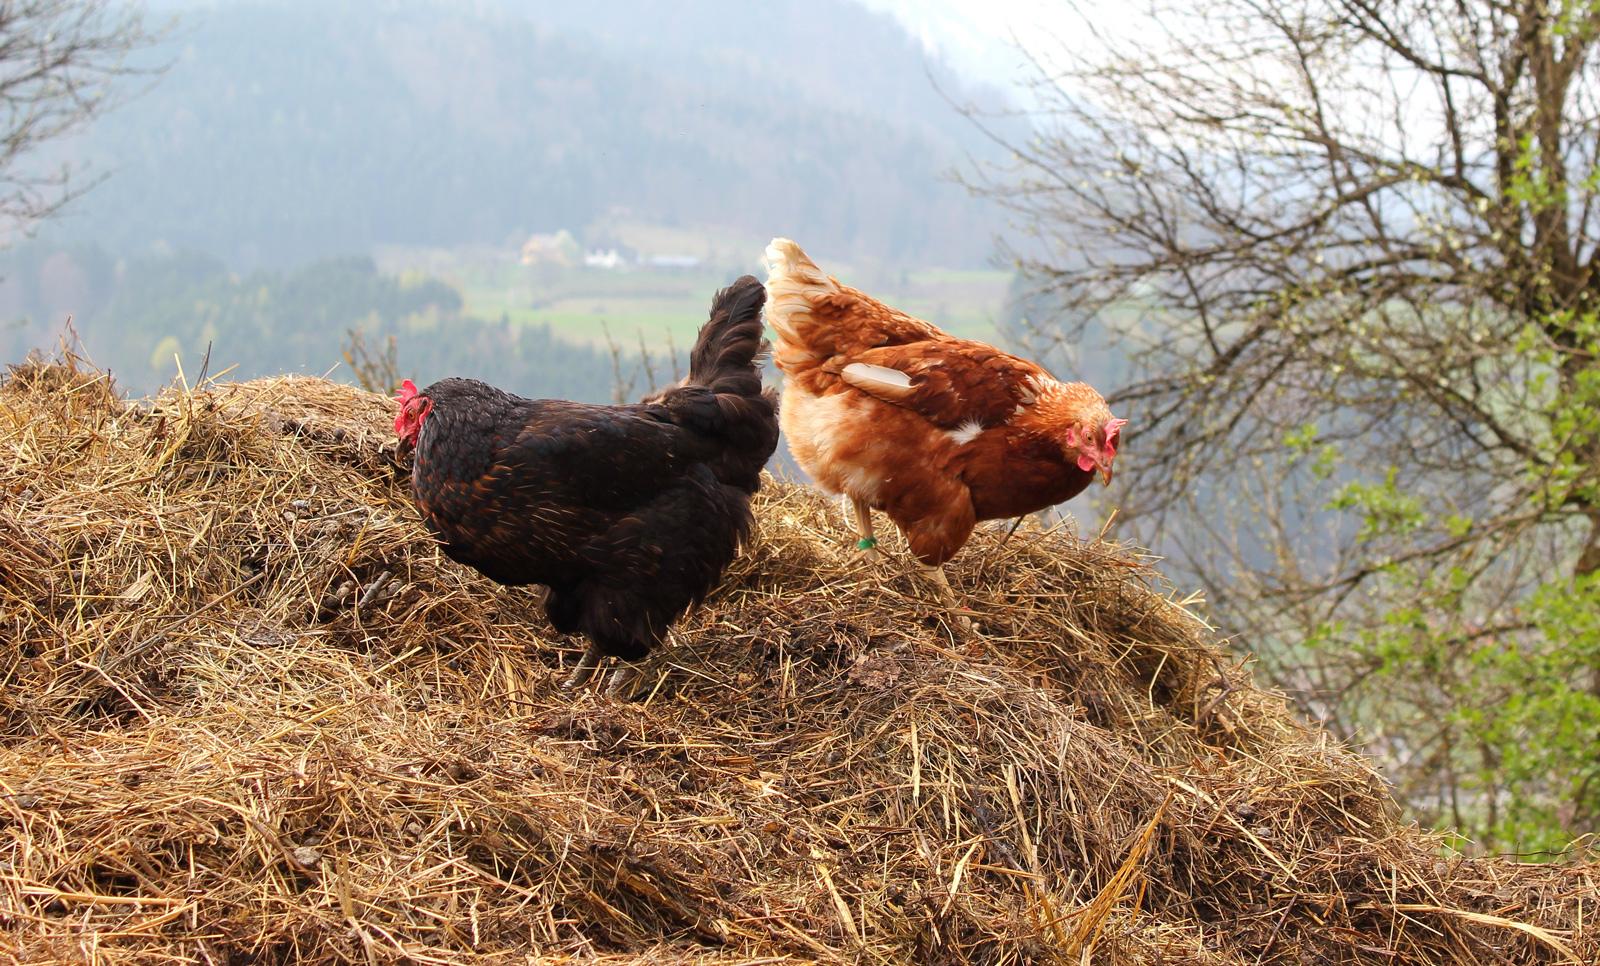 McMurray Hatchery Blog | Composting Chicken Manure Fertilizer